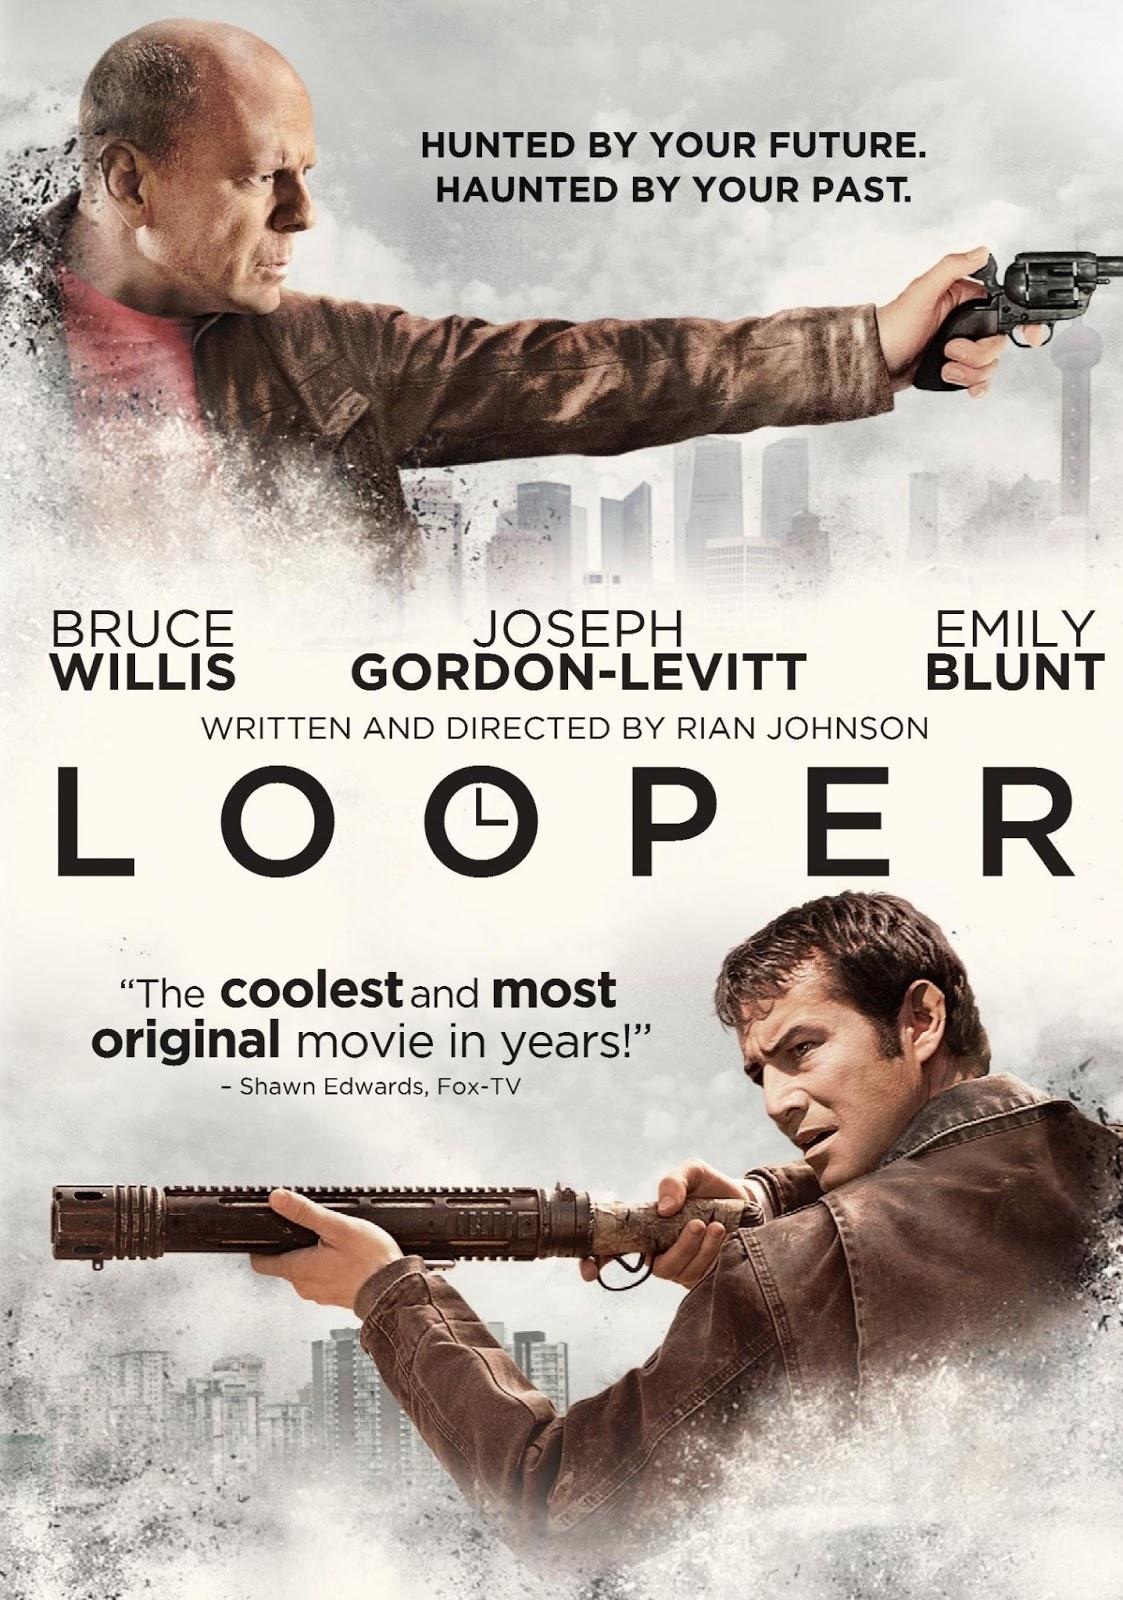 http://4.bp.blogspot.com/-6NMP1pL2Itk/UPUCuUFt-eI/AAAAAAAAFsg/MJFAExmKIIM/s1600/Looper+dvd.jpg